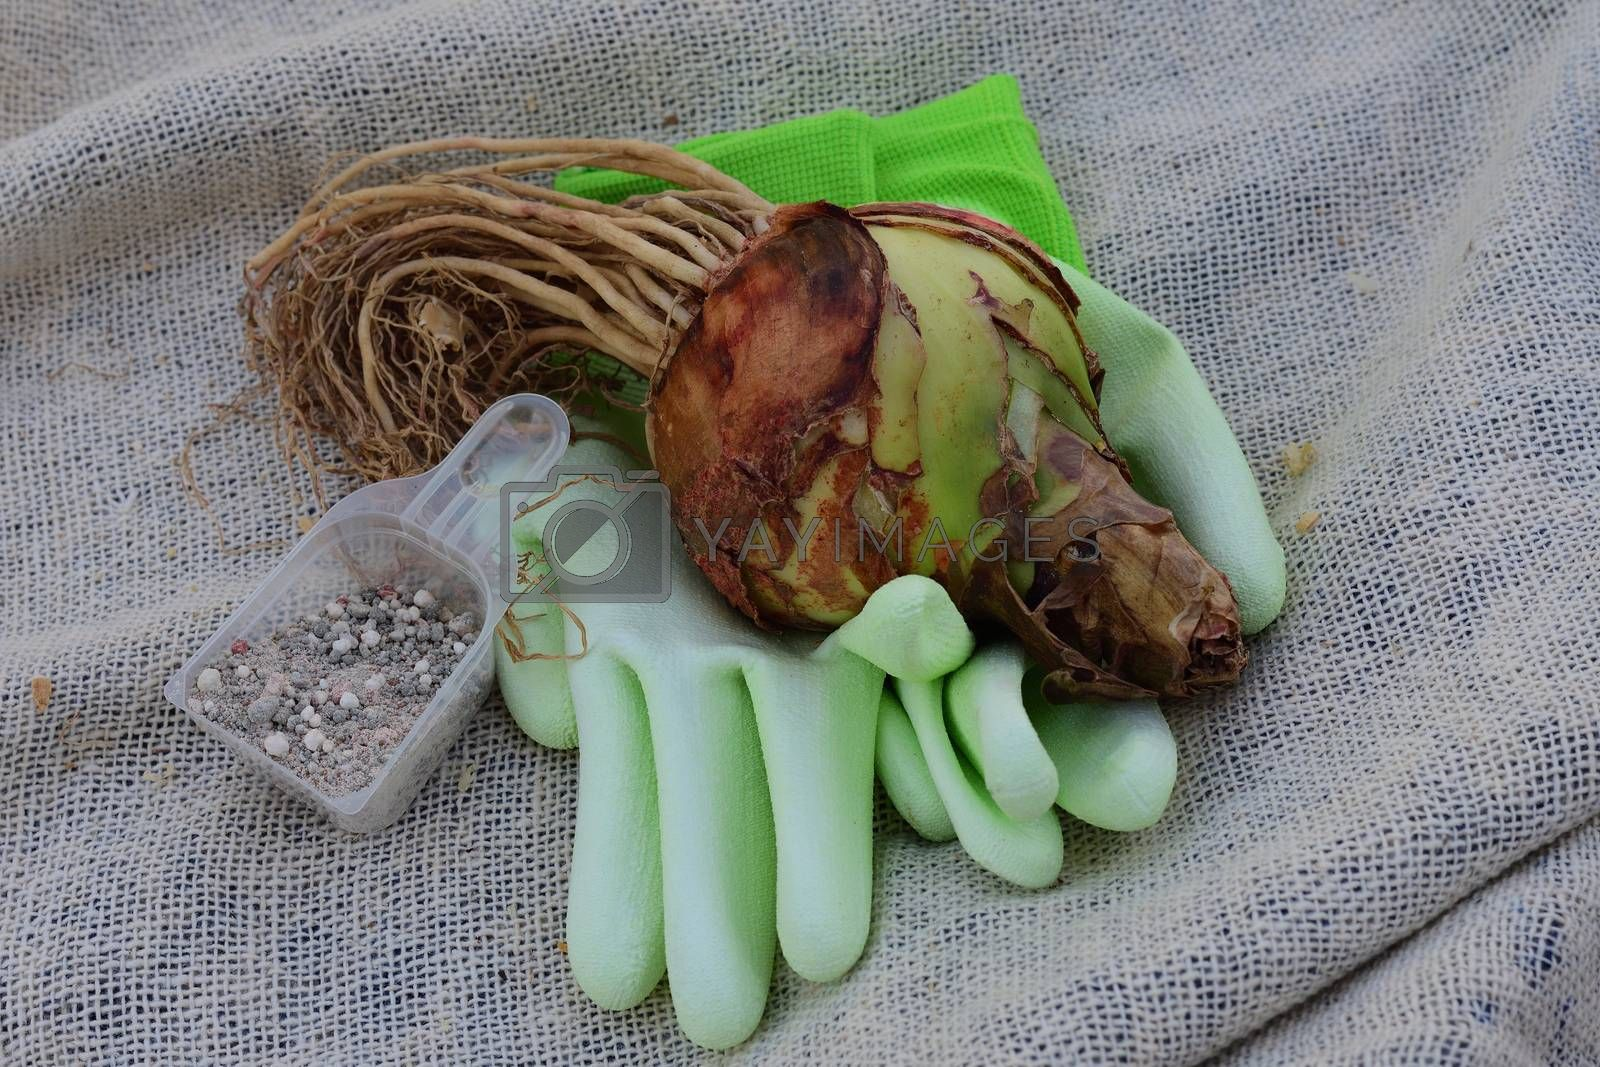 premium quality Amaryllis (Hippeastrum) bulb and garden accessories